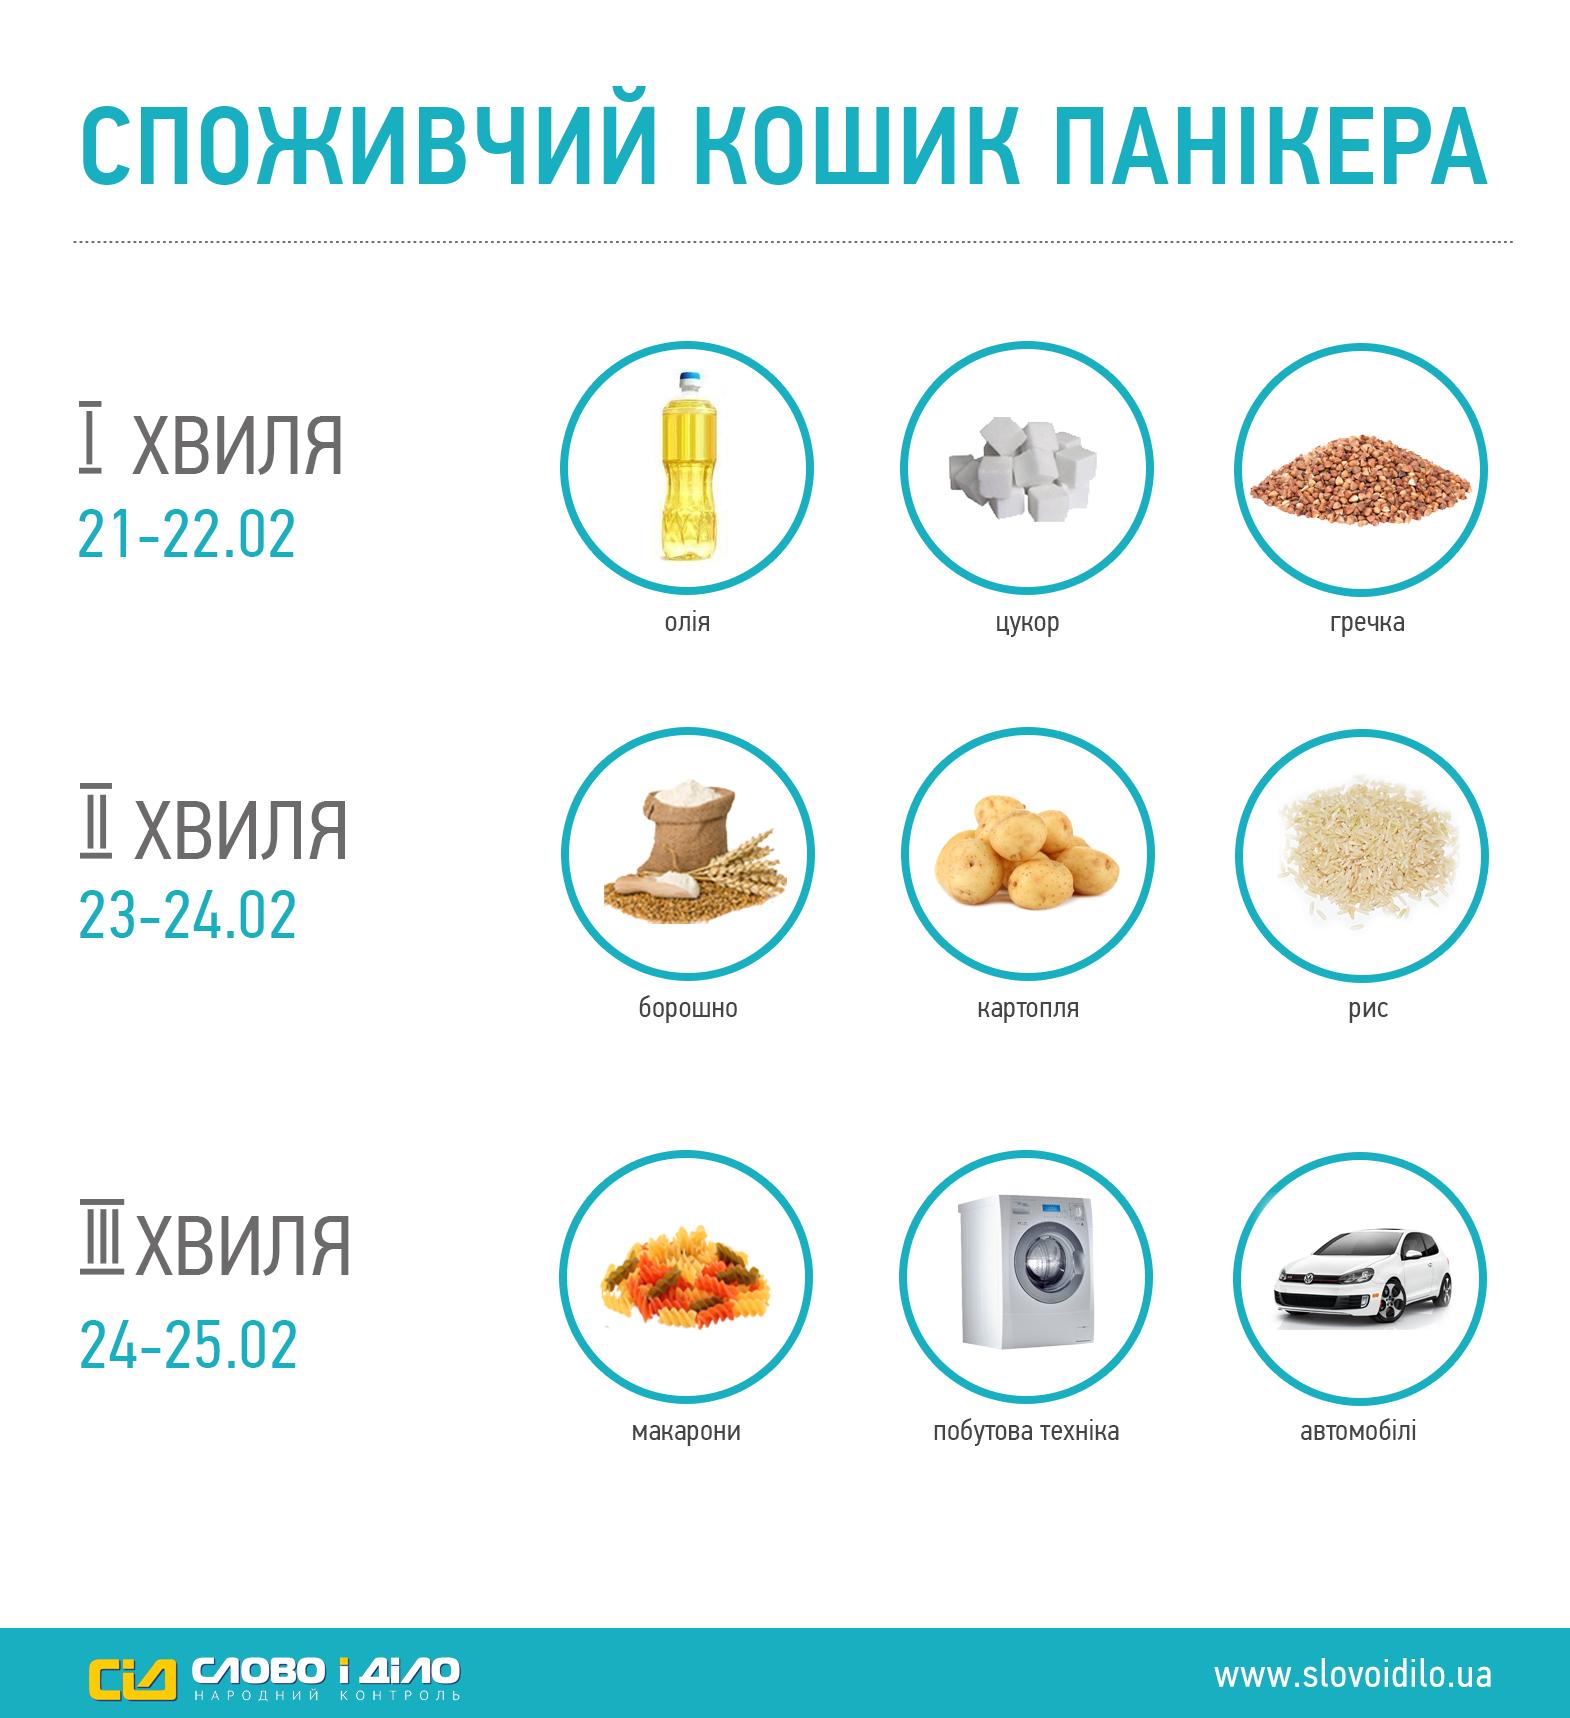 http://www.slovoidilo.ua/uploads/news/0c032eabfcc6838a033155ef894eedb7.png